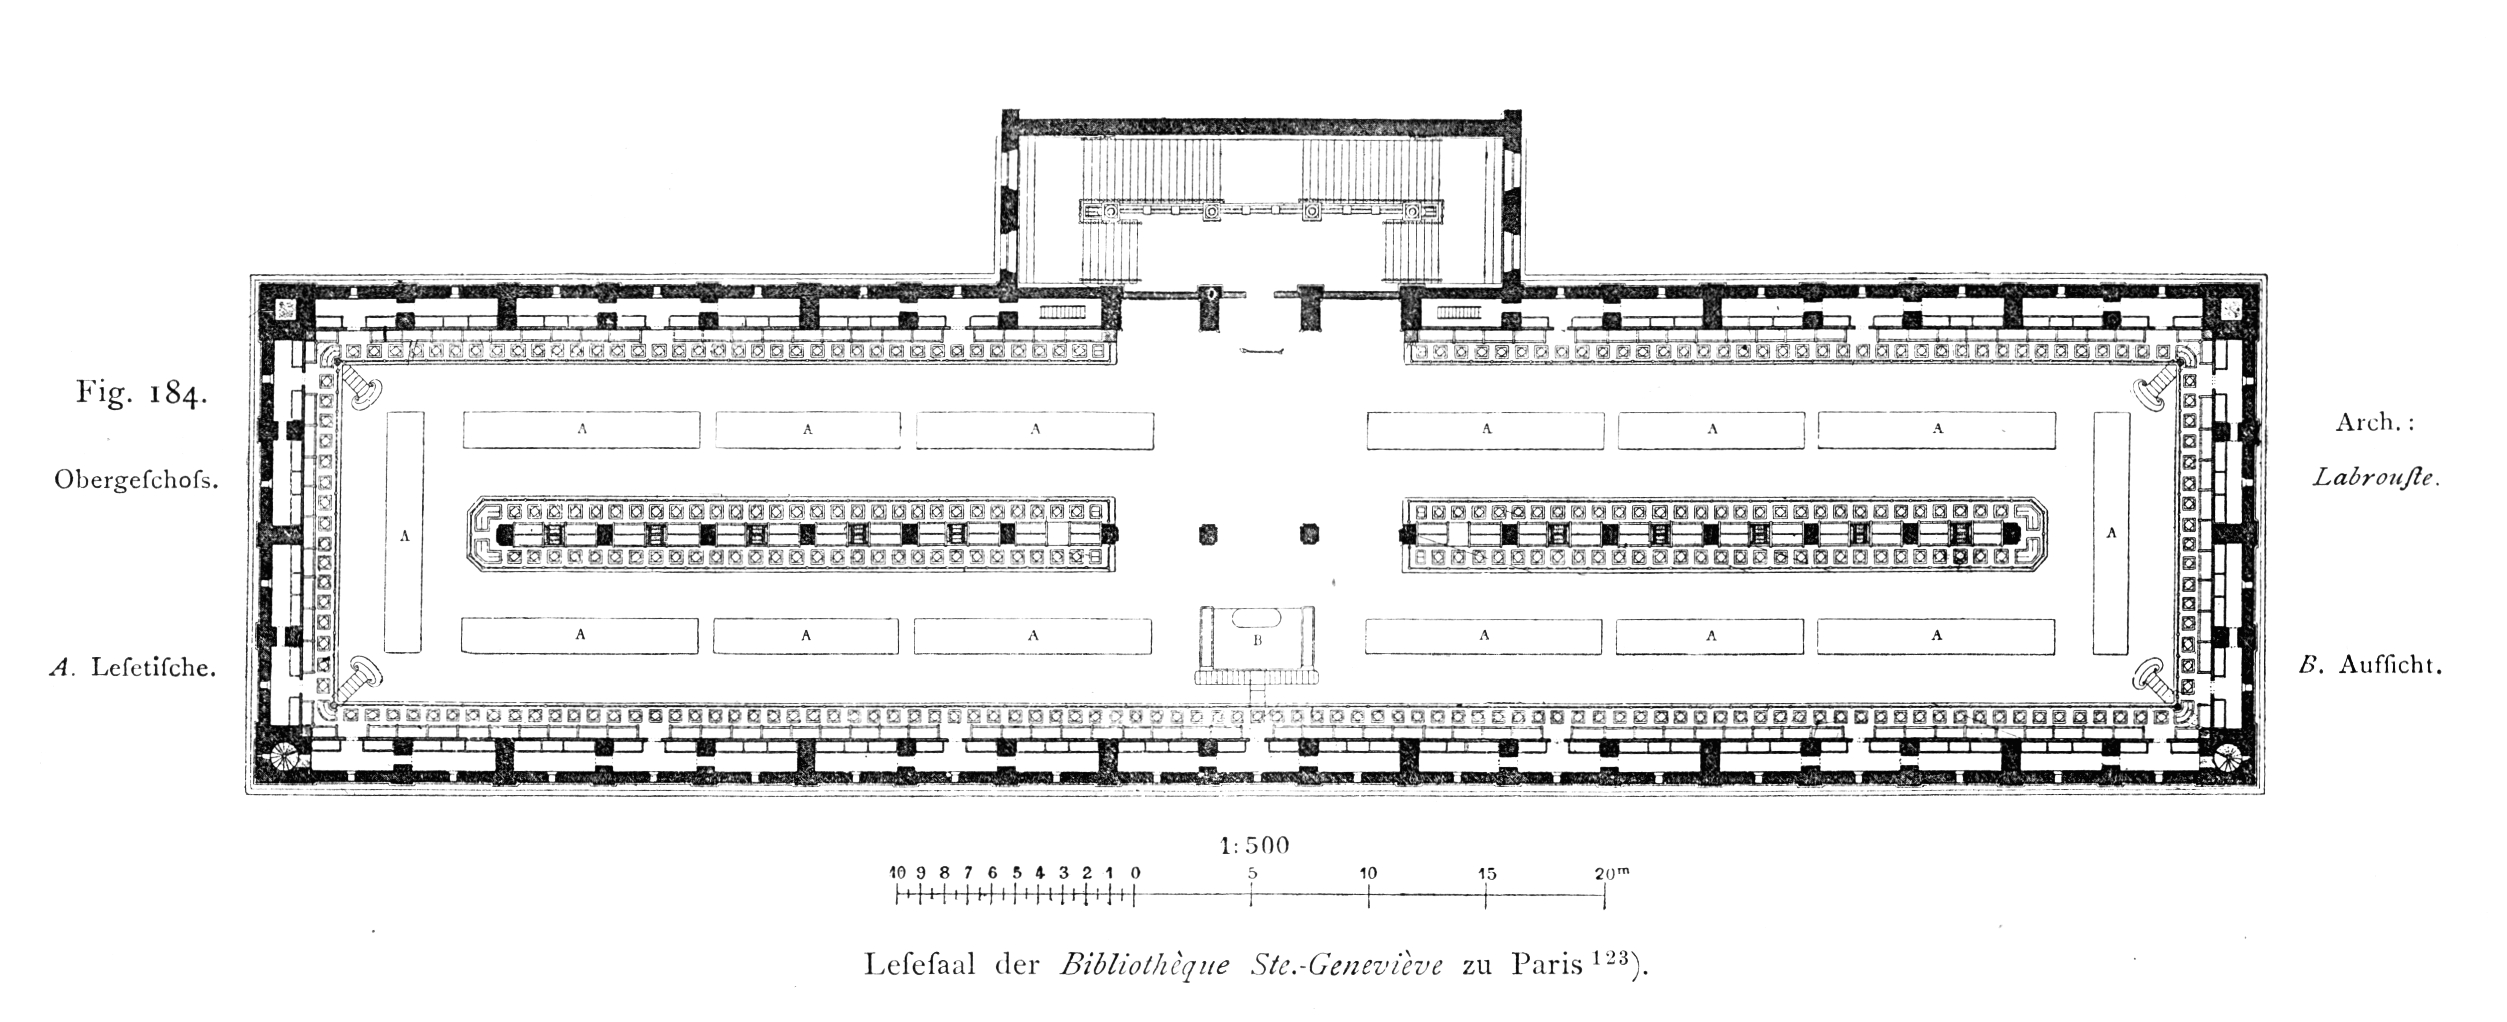 floor plan jpg wikipedia